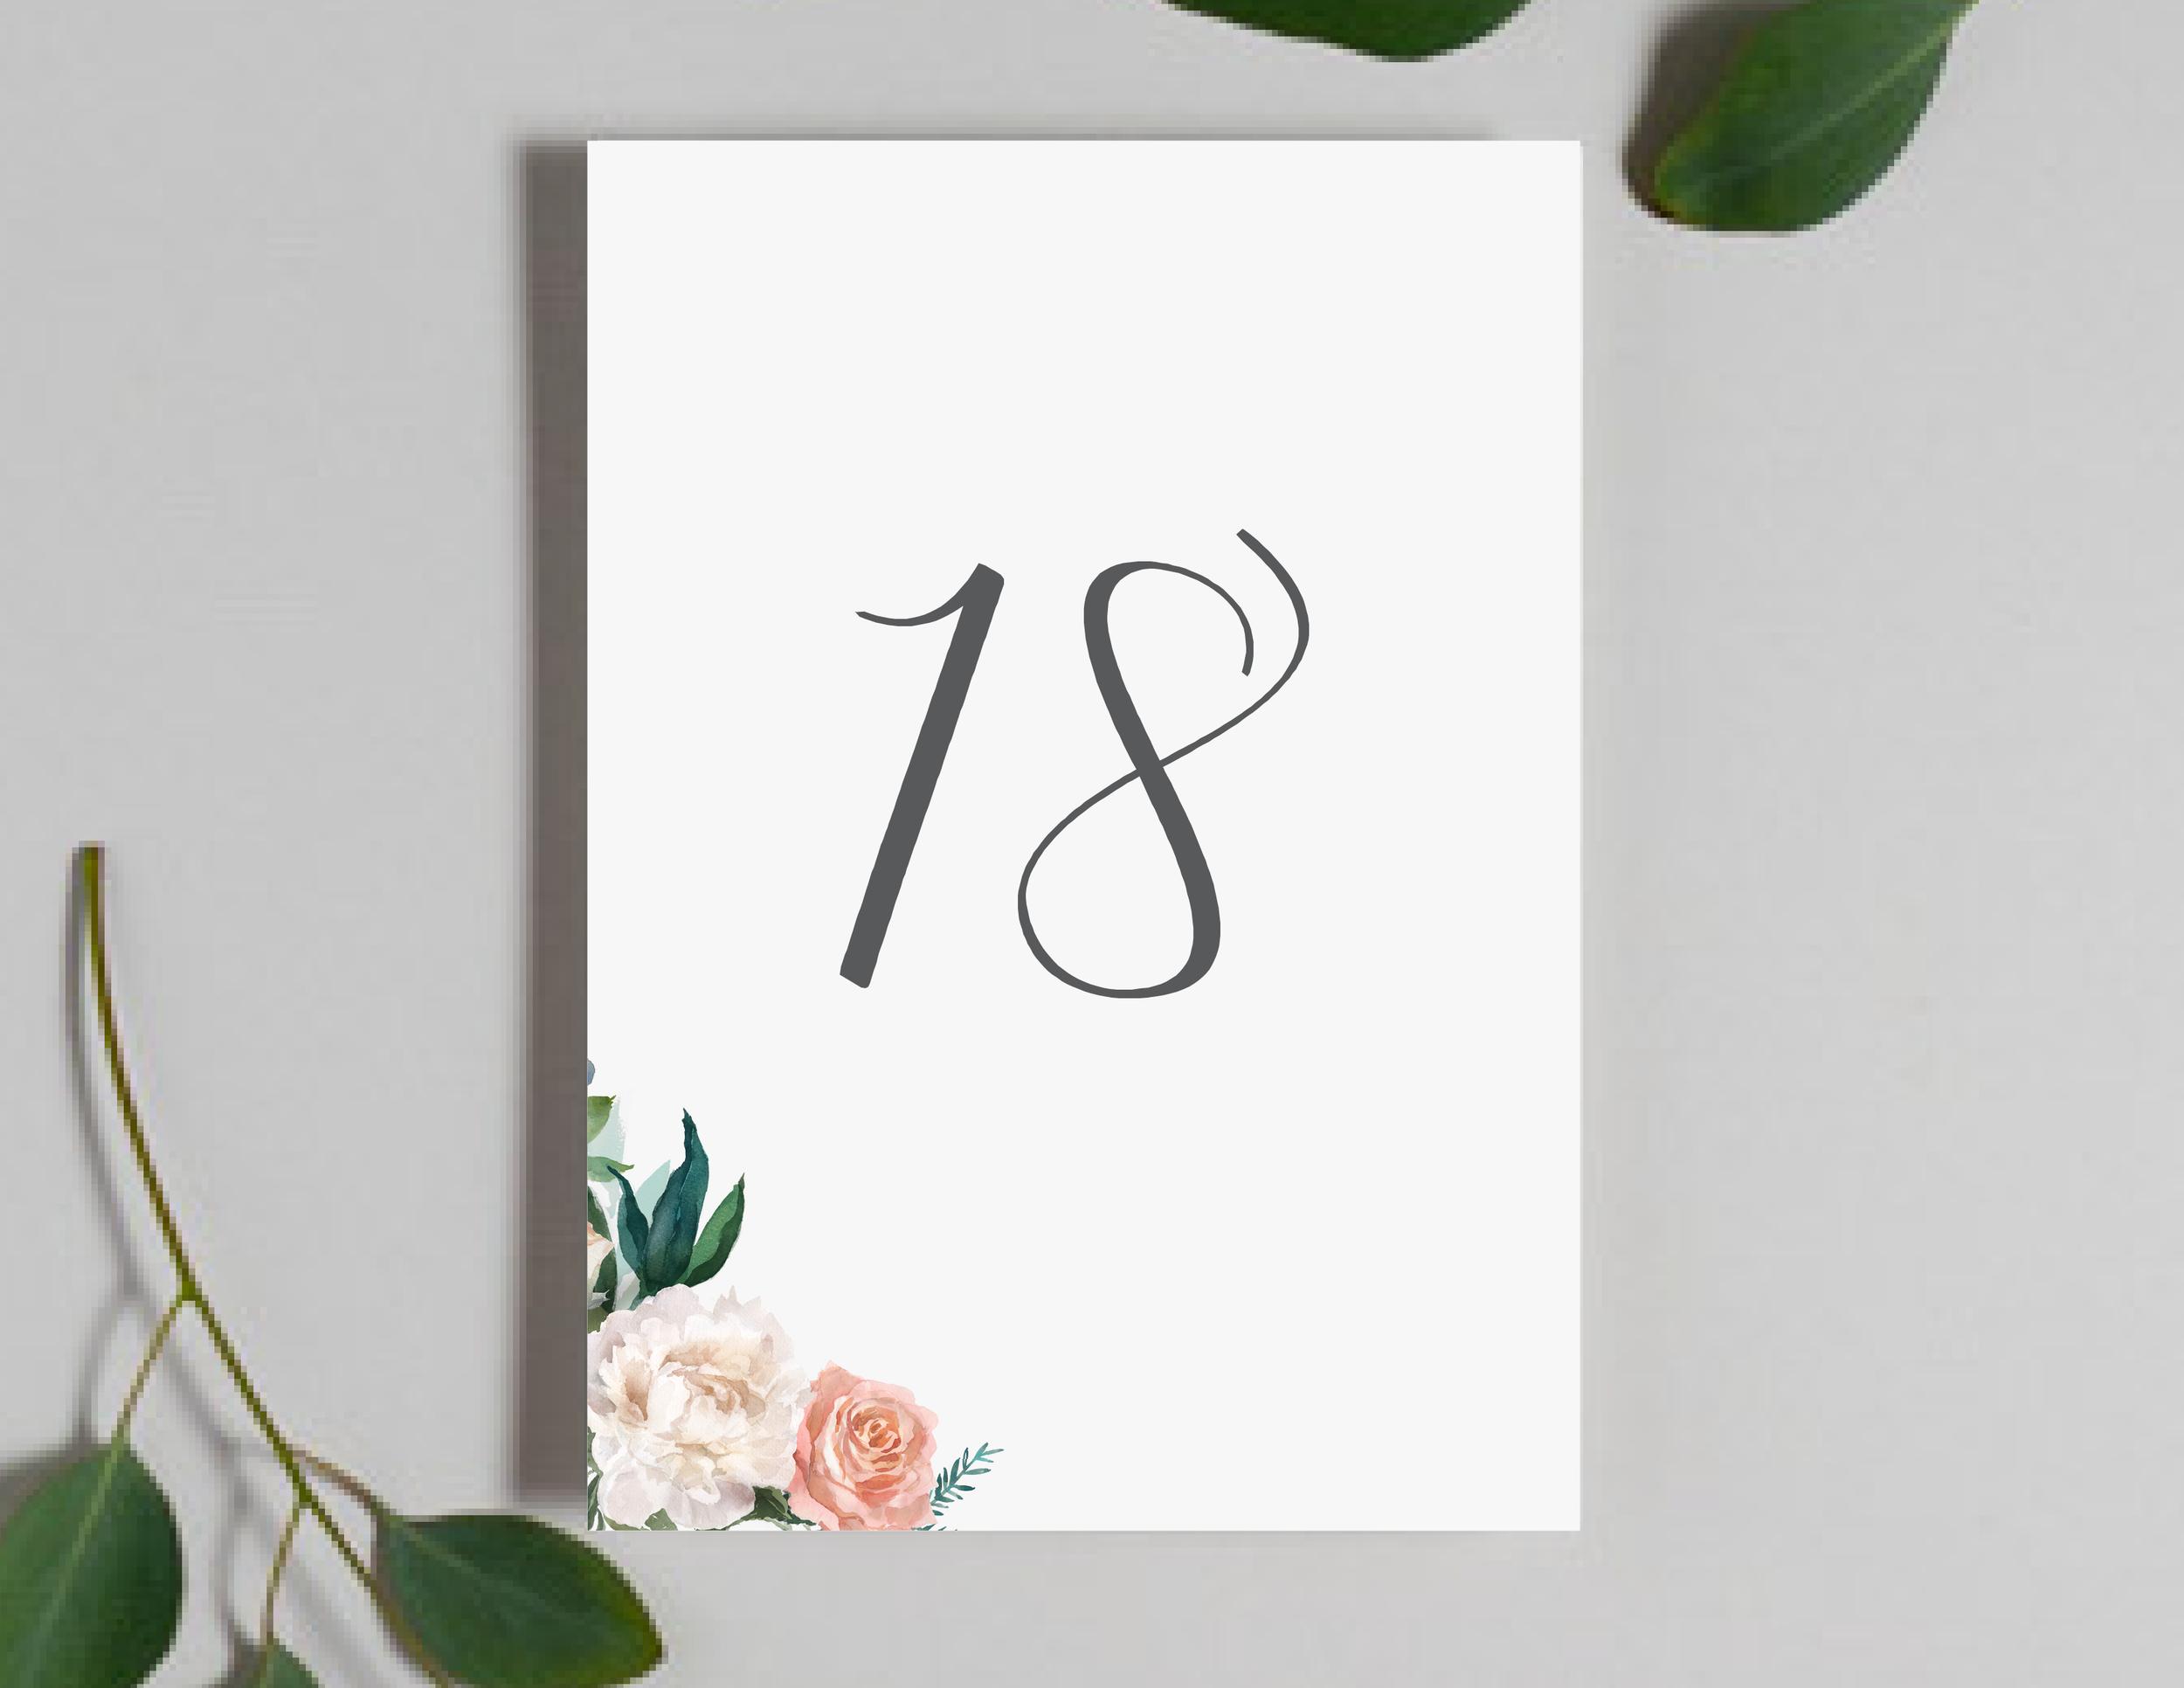 Simple Script Table Numbers by Just Jurf-01.png